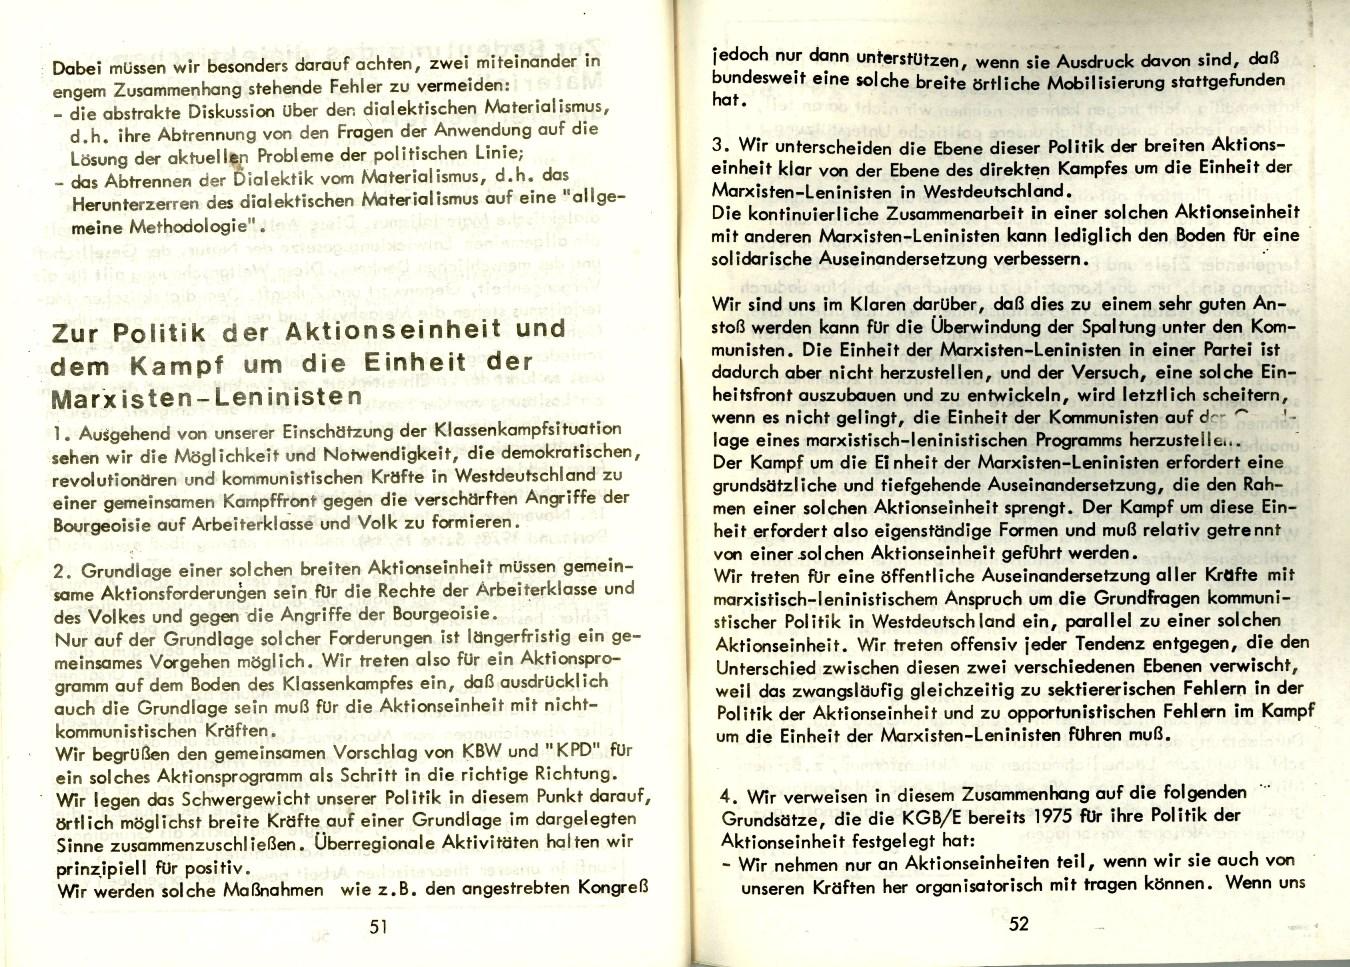 KGBE_1978_Resolutionen_27